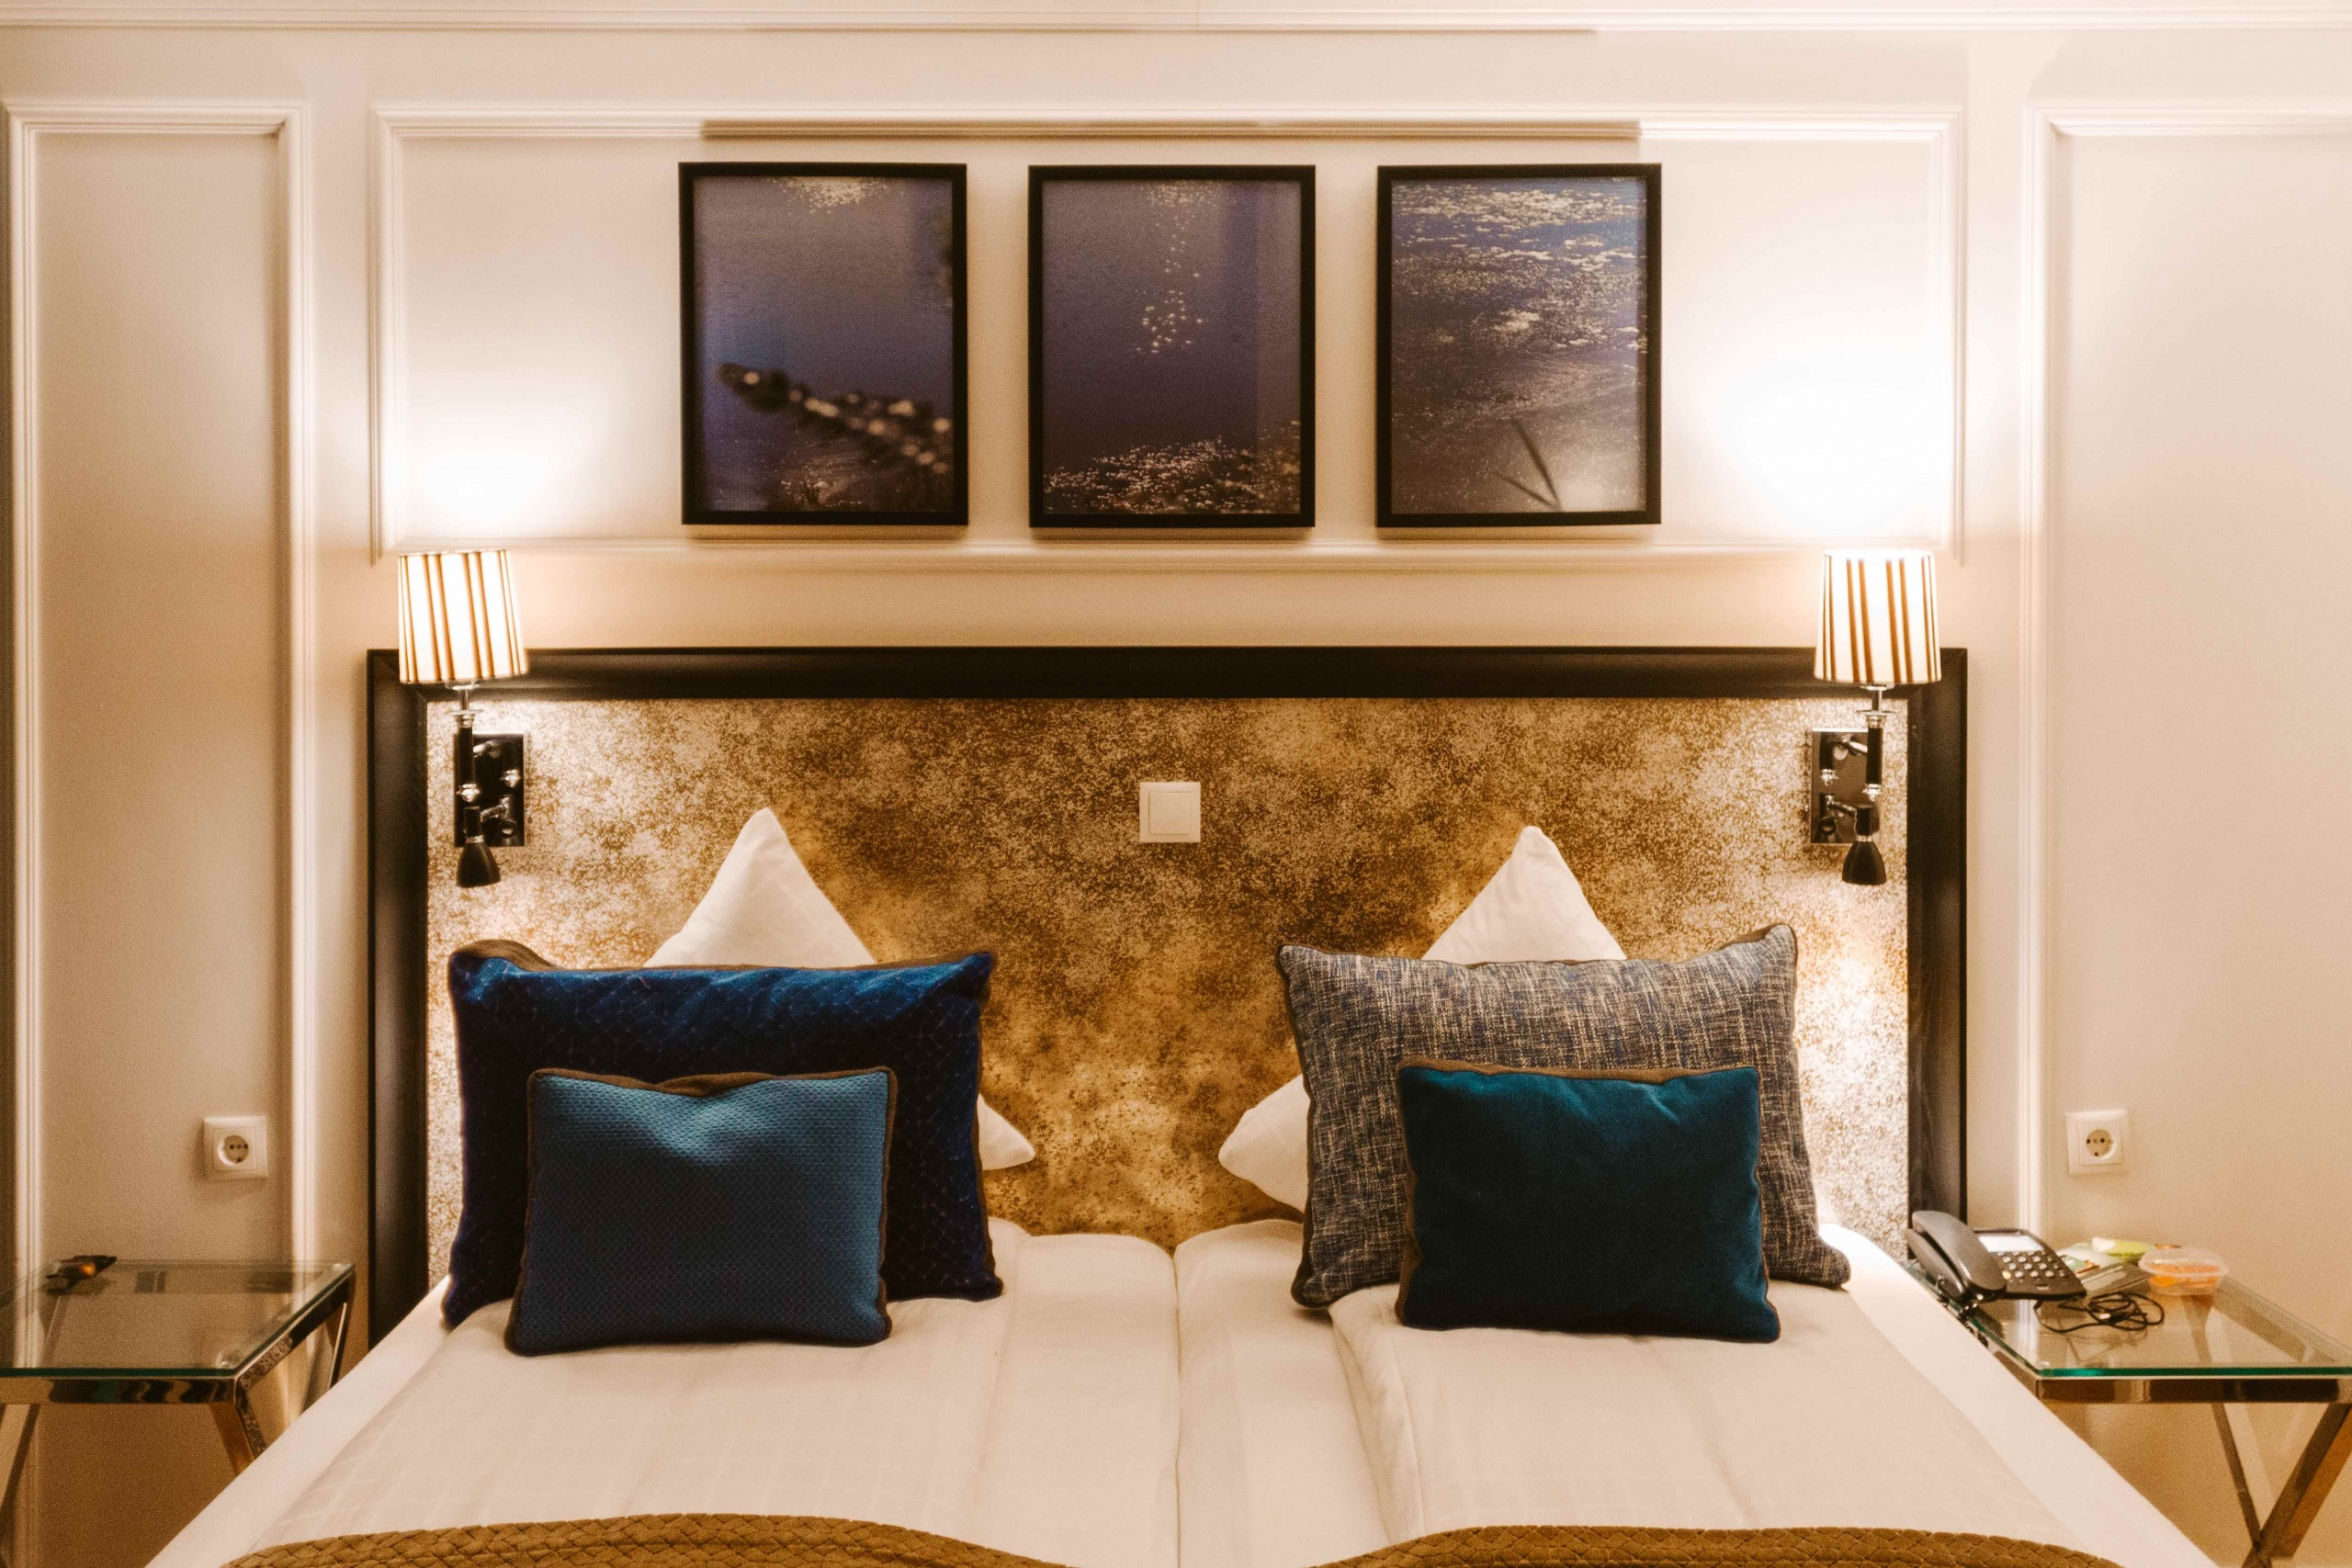 dove dormire a Copnhagen: stanza matrimoniale Absalon Hotel